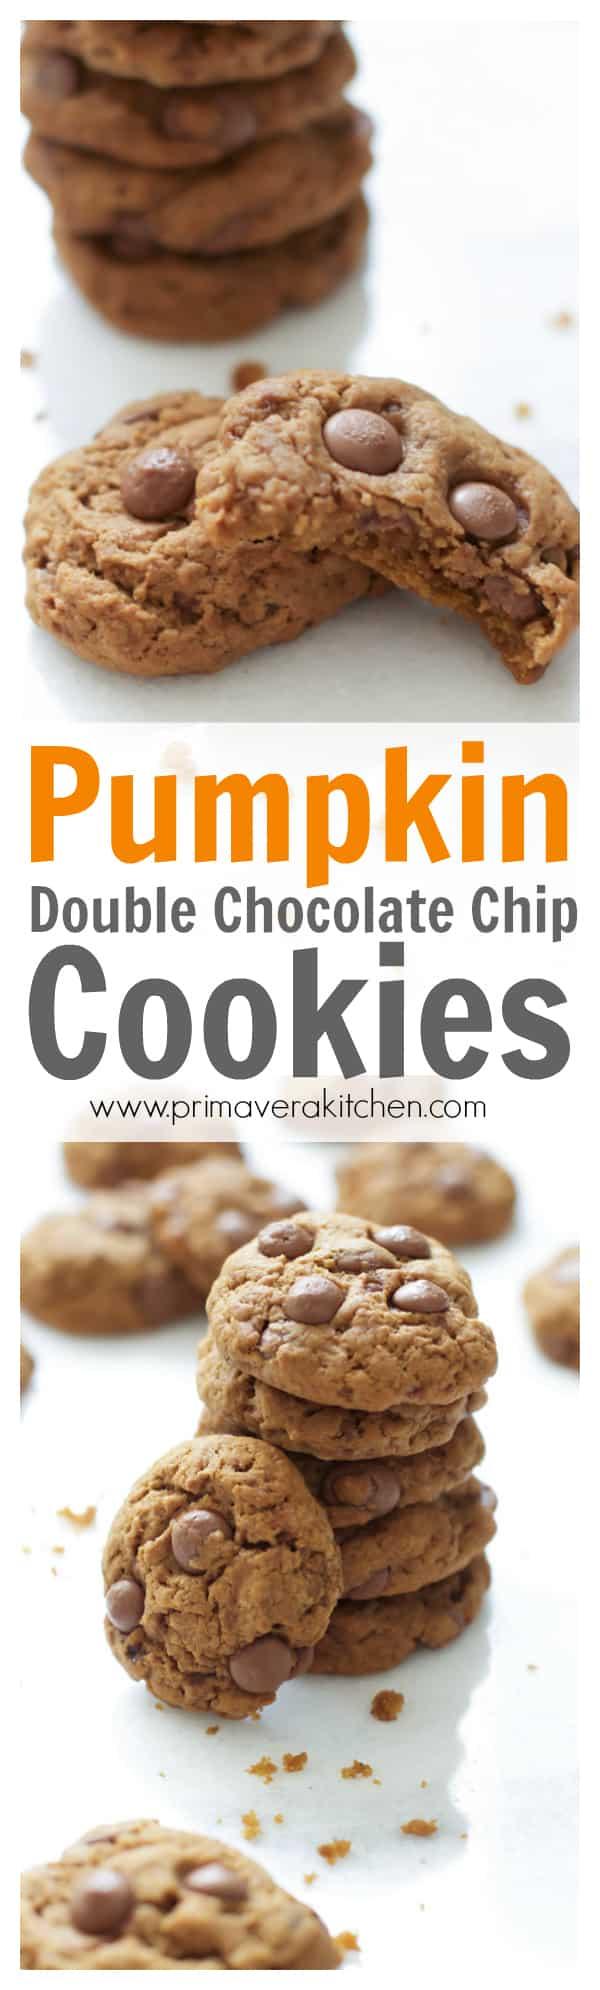 Pumpkin Double Chocolate Chip Cookies - Primavera Kitchen